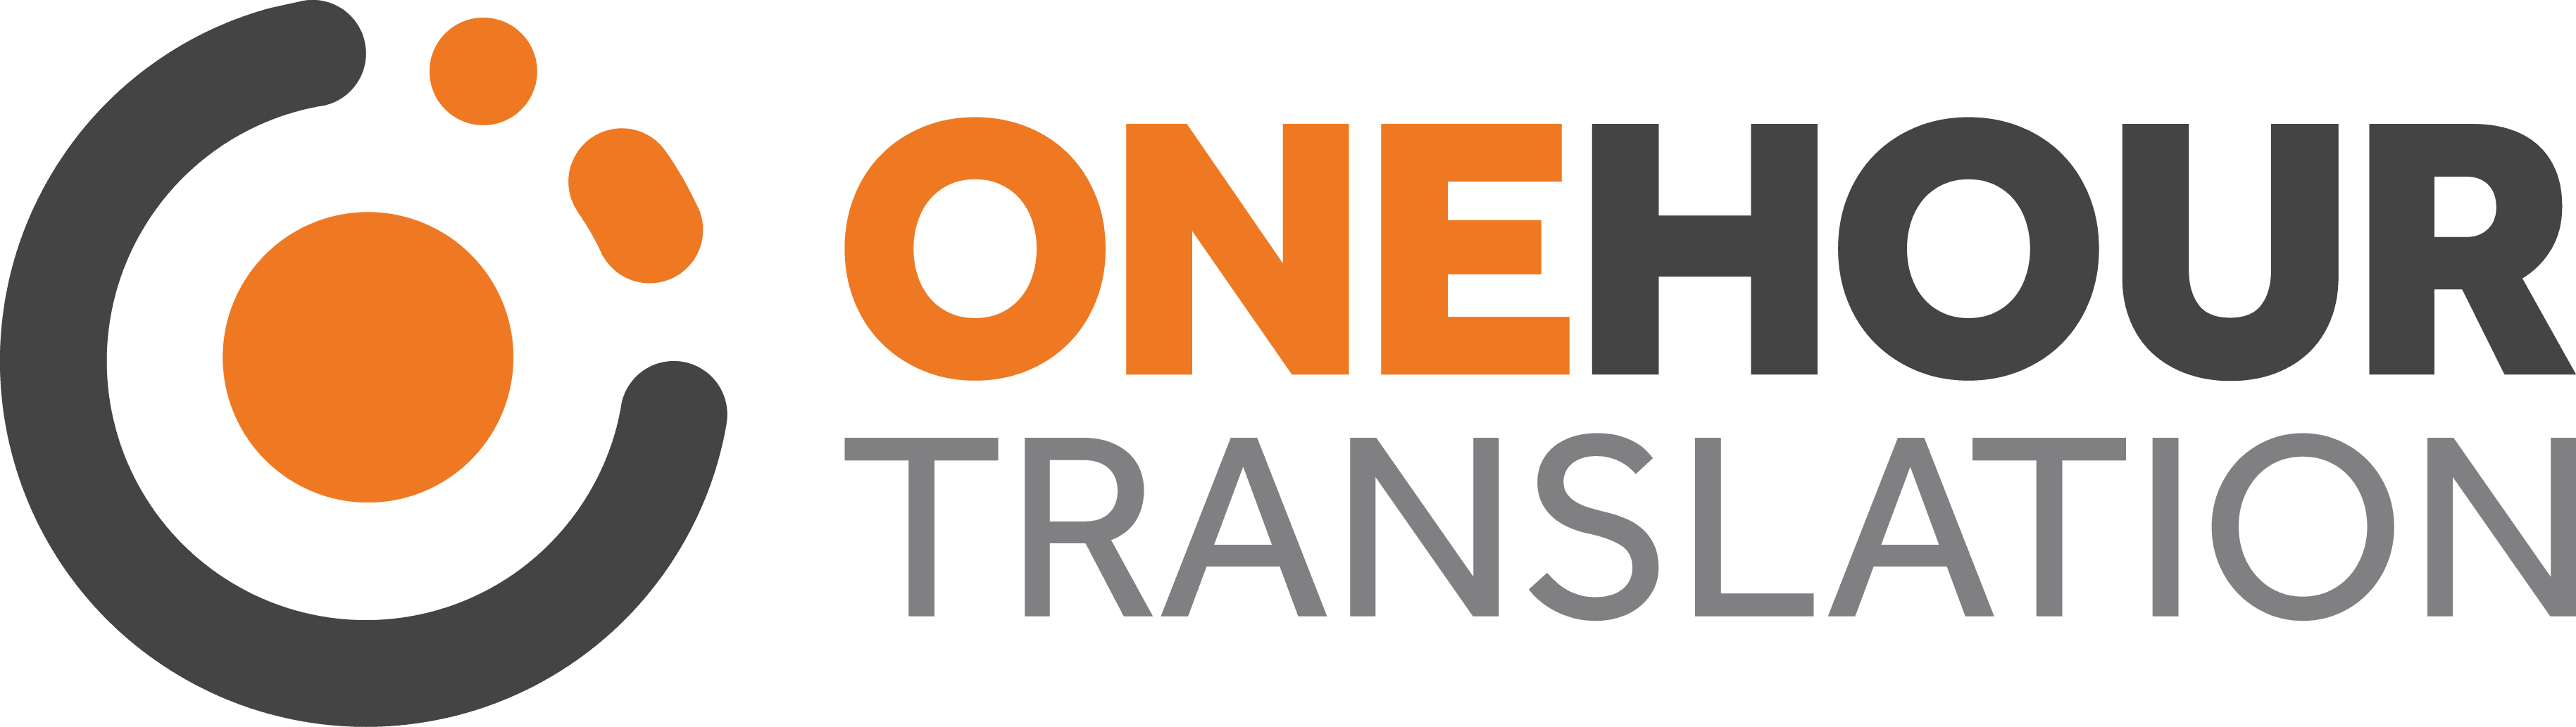 One Hour Translation - Crunchbase Company Profile & Funding